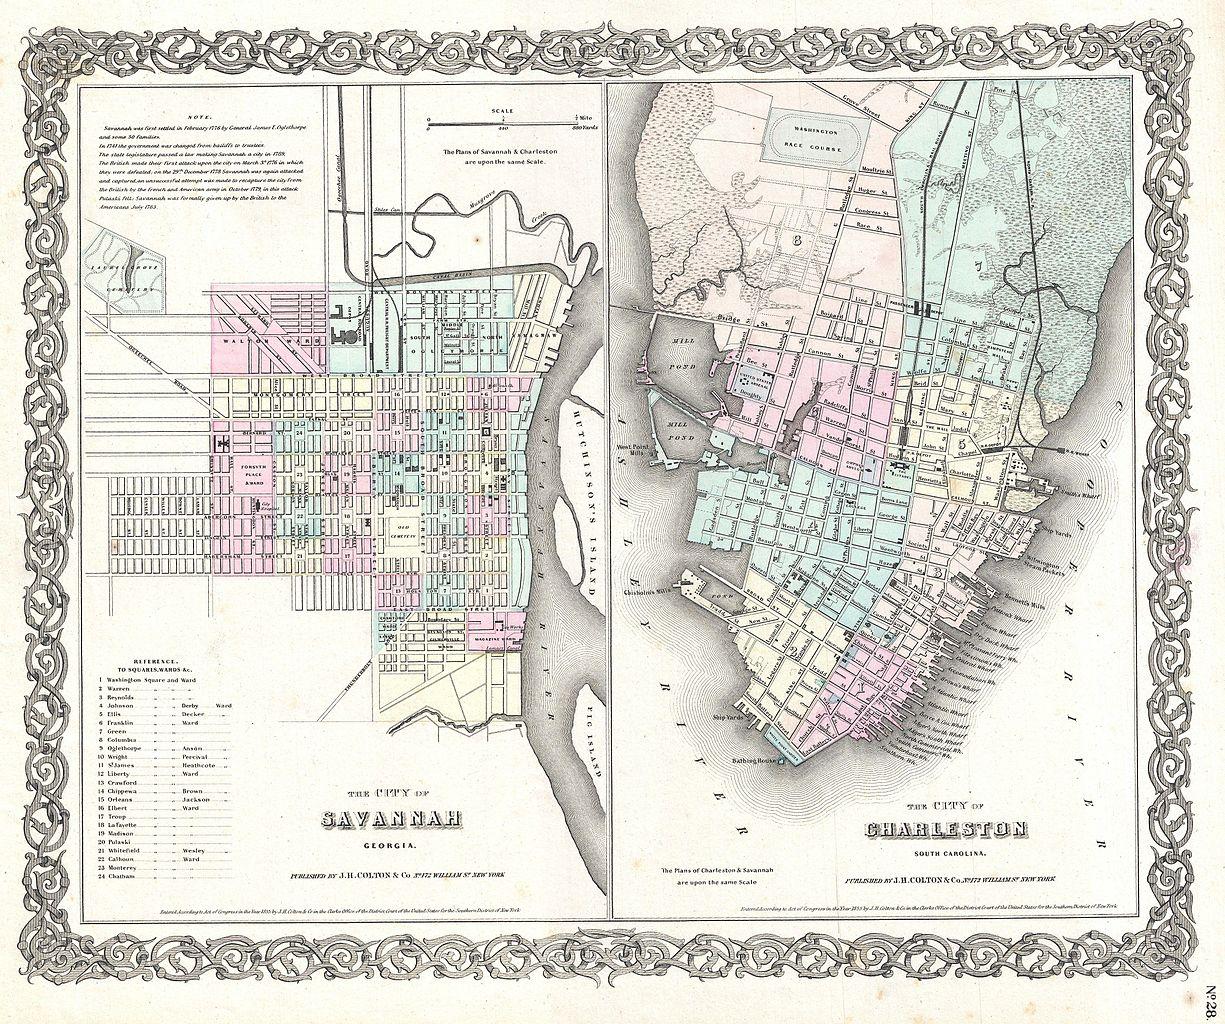 File 1855 Colton Plan Or Map Of Charleston South Carolina And Savannah Georgia Geographicus Charlestonsavannah Colton 1855 Jpg Wikimedia Commons